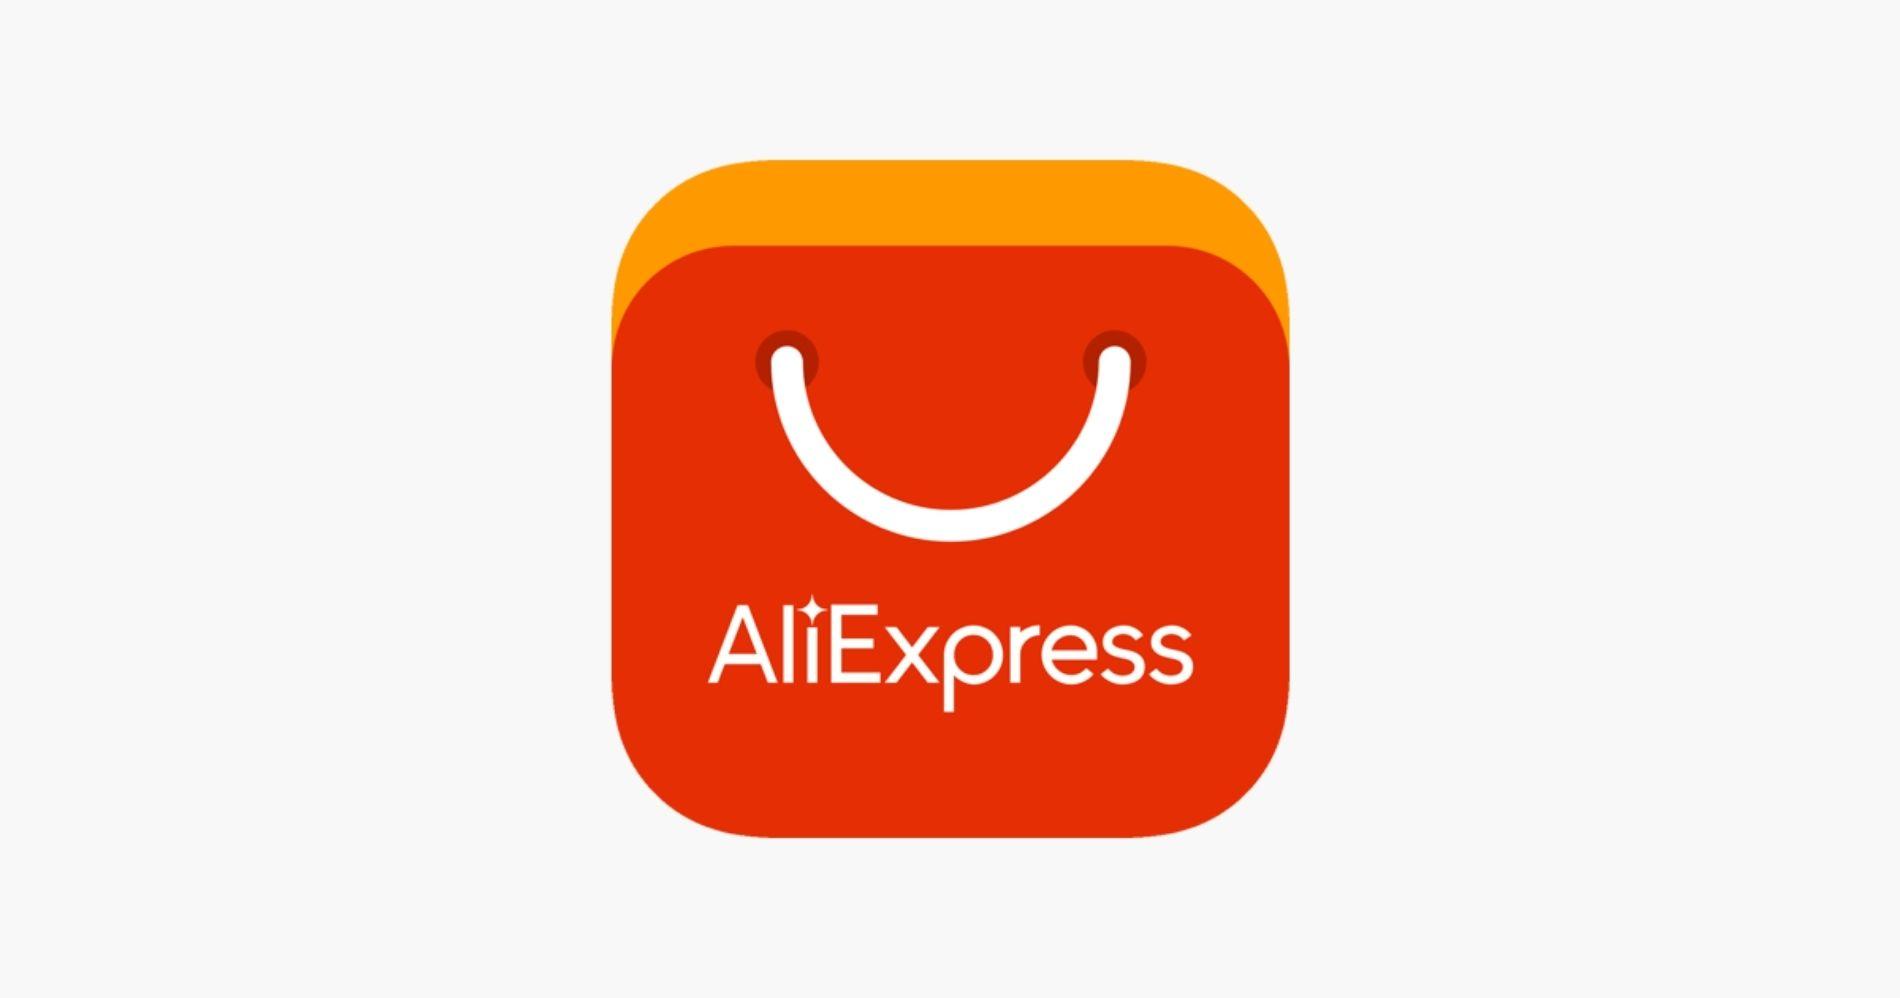 AliExpress Web Bisnis Muda - Google